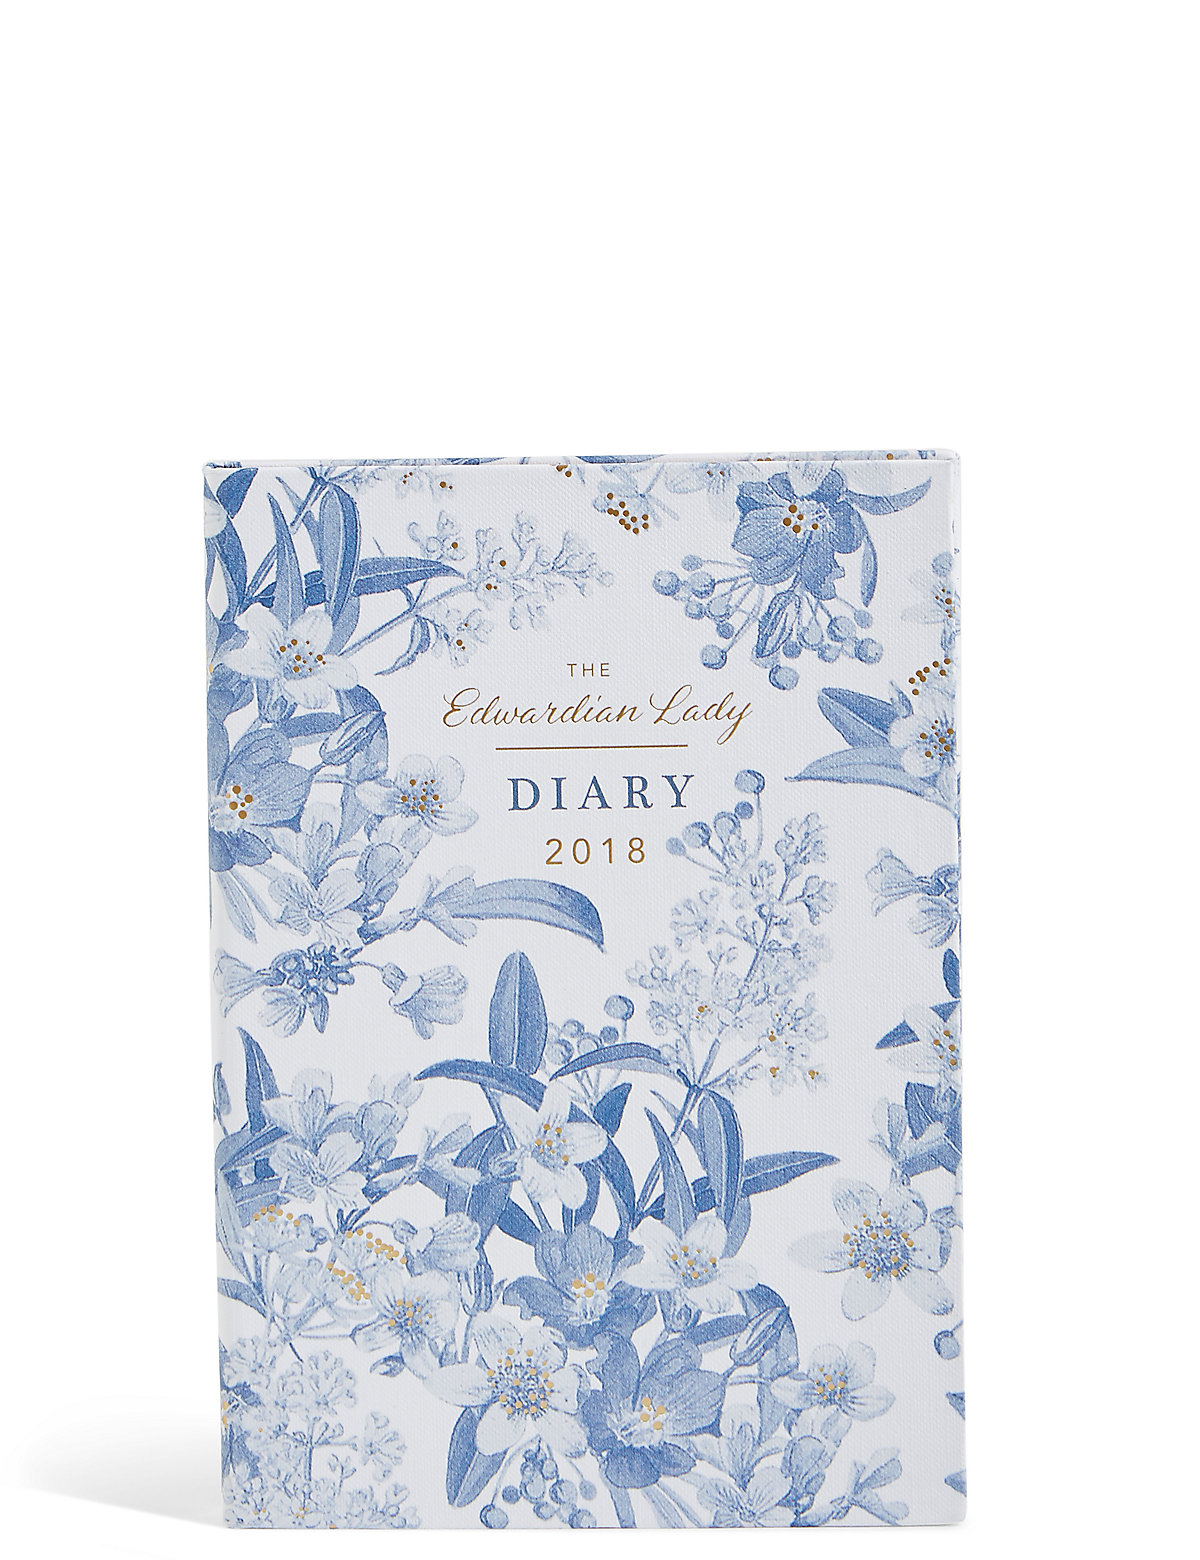 Small Edwardian Lady 2018 Diary